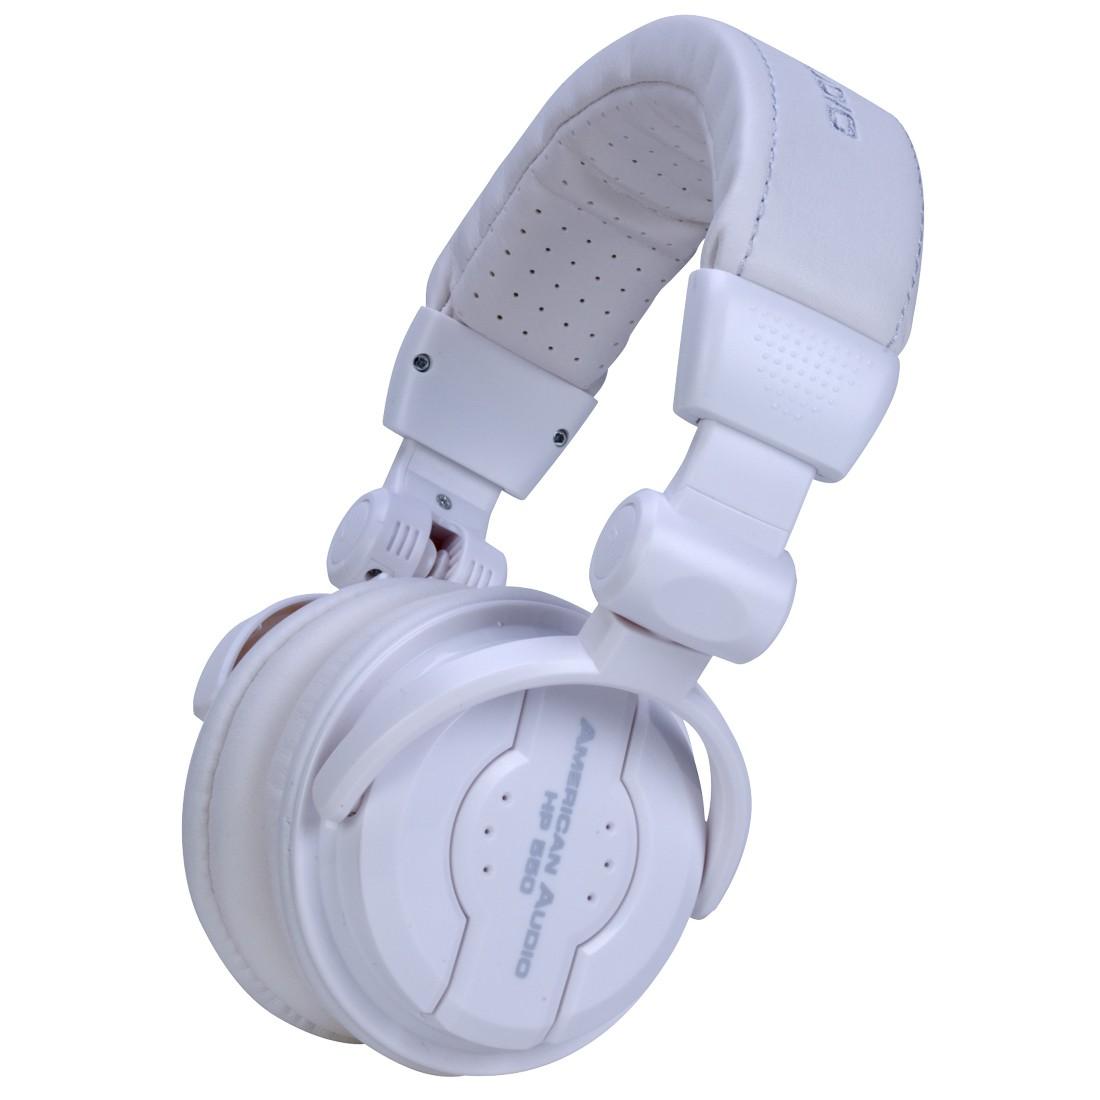 American Audio HP 550 Snow Professional High Powered DJ